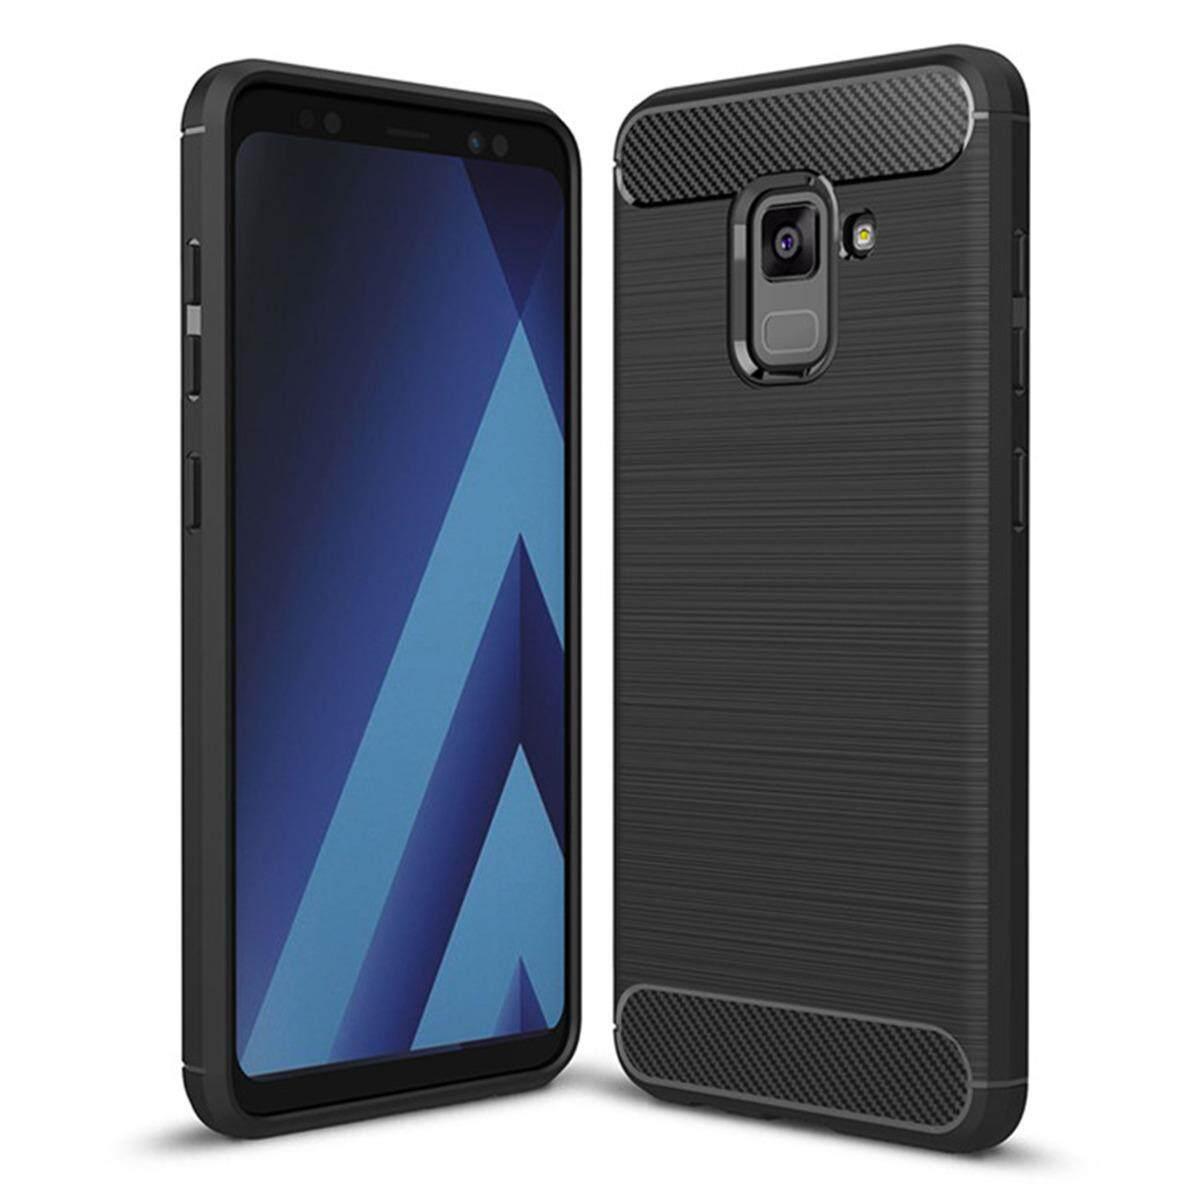 Hình ảnh for Samsung Galaxy A5(2018 Version) Case Carbon Fibre Hairline Ultrathin Soft TPU Back Case Cover, Light, Minimalist, Non-slip, Shockproof, Anti-scratch